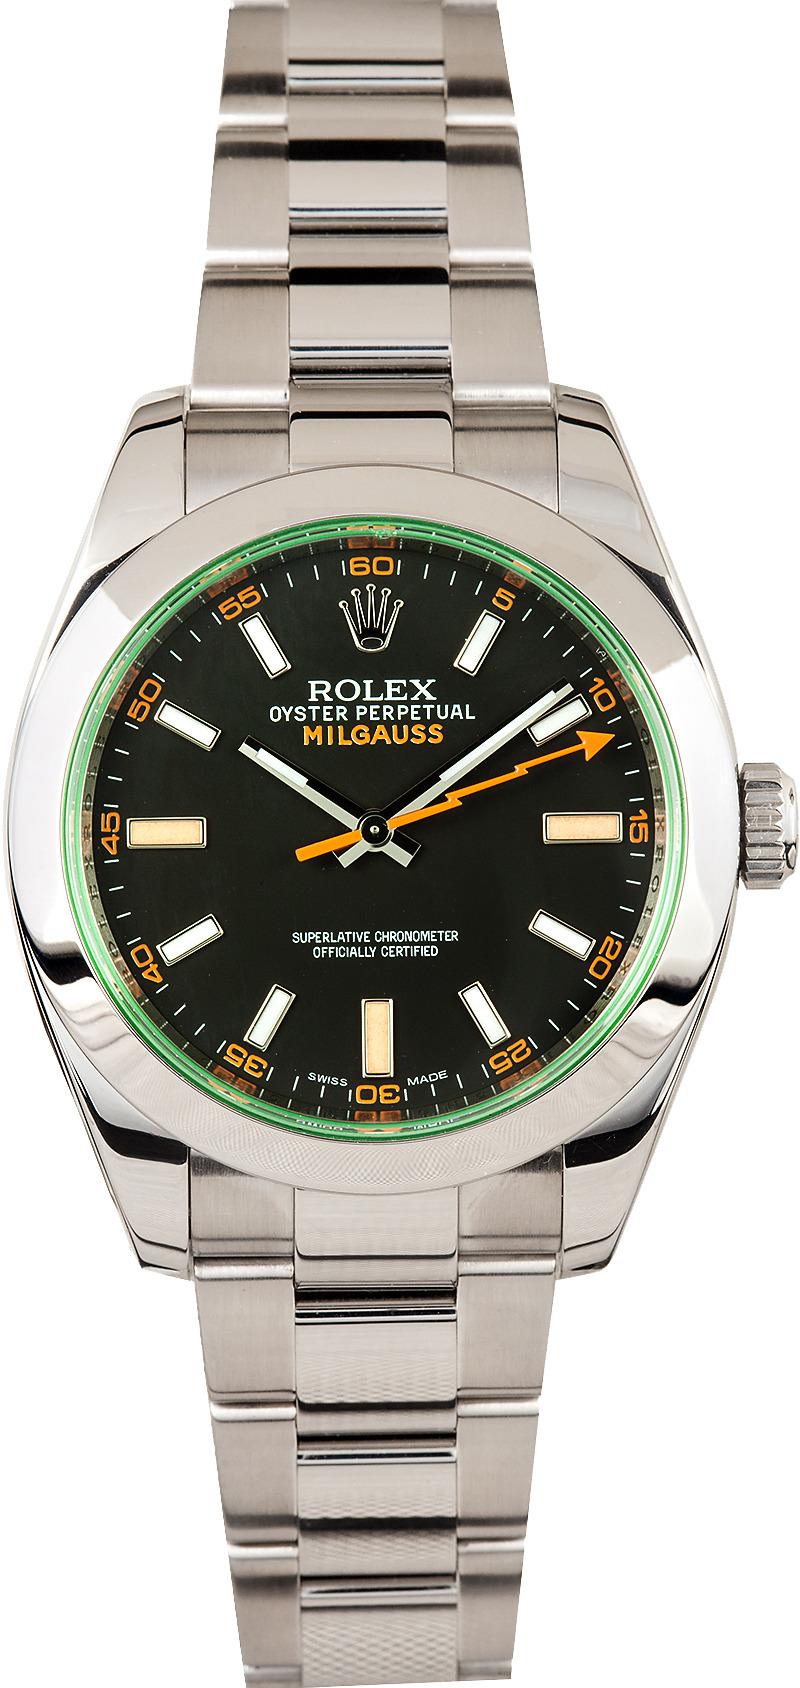 Rolex milgauss 116400gv bob 39 s watches for Rolex milgauss